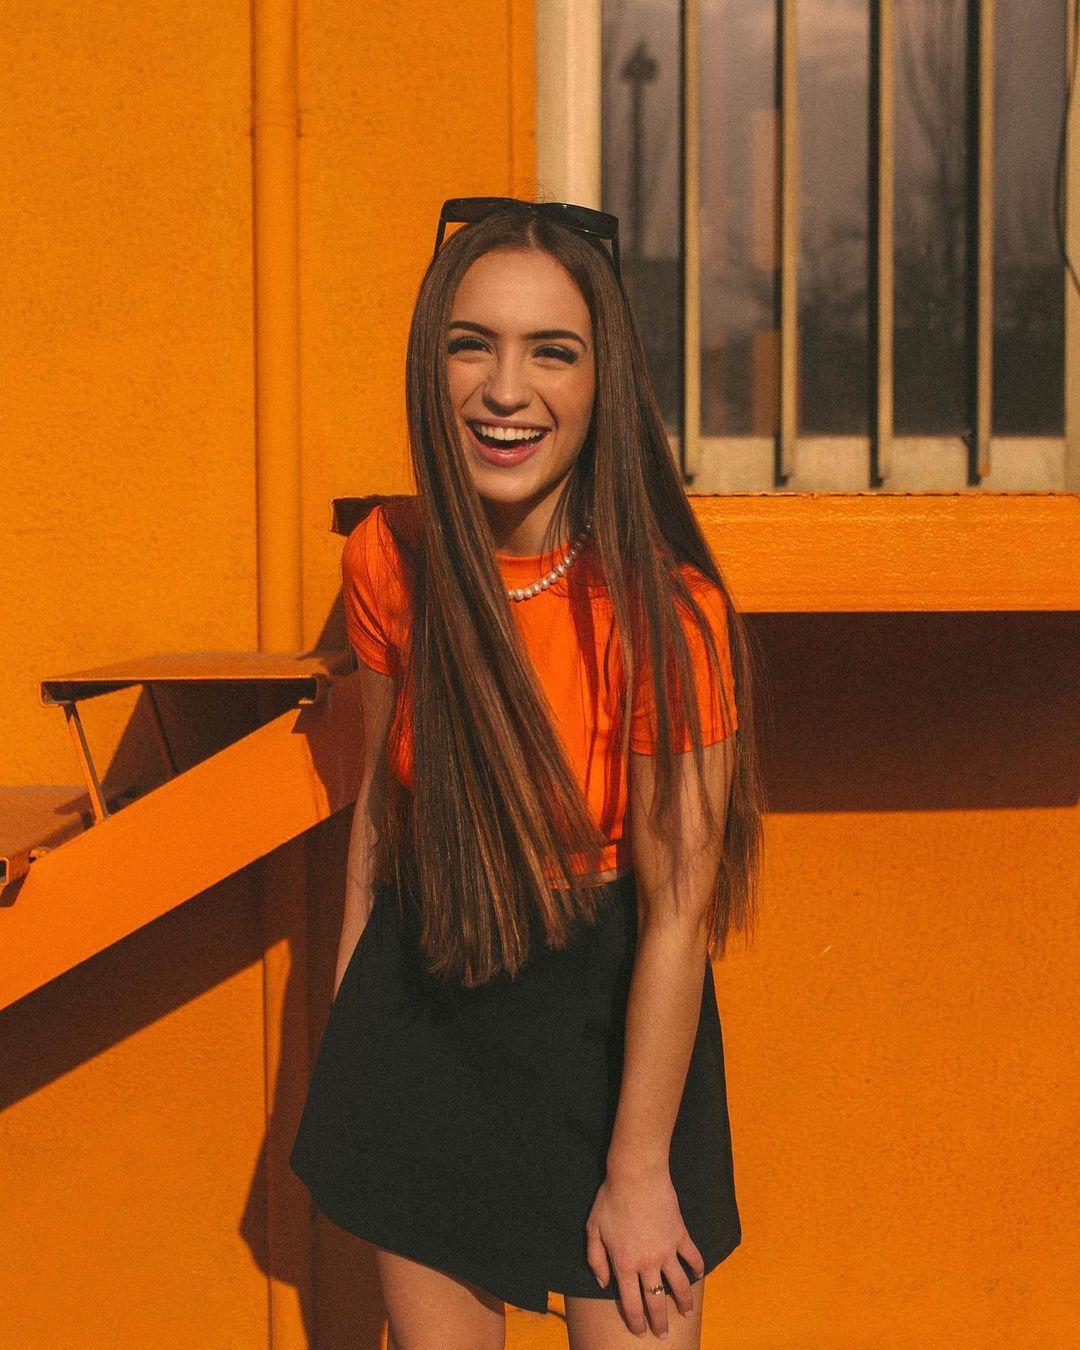 Lidia-Rauet-Wallpapers-Insta-Fit-Bio-1